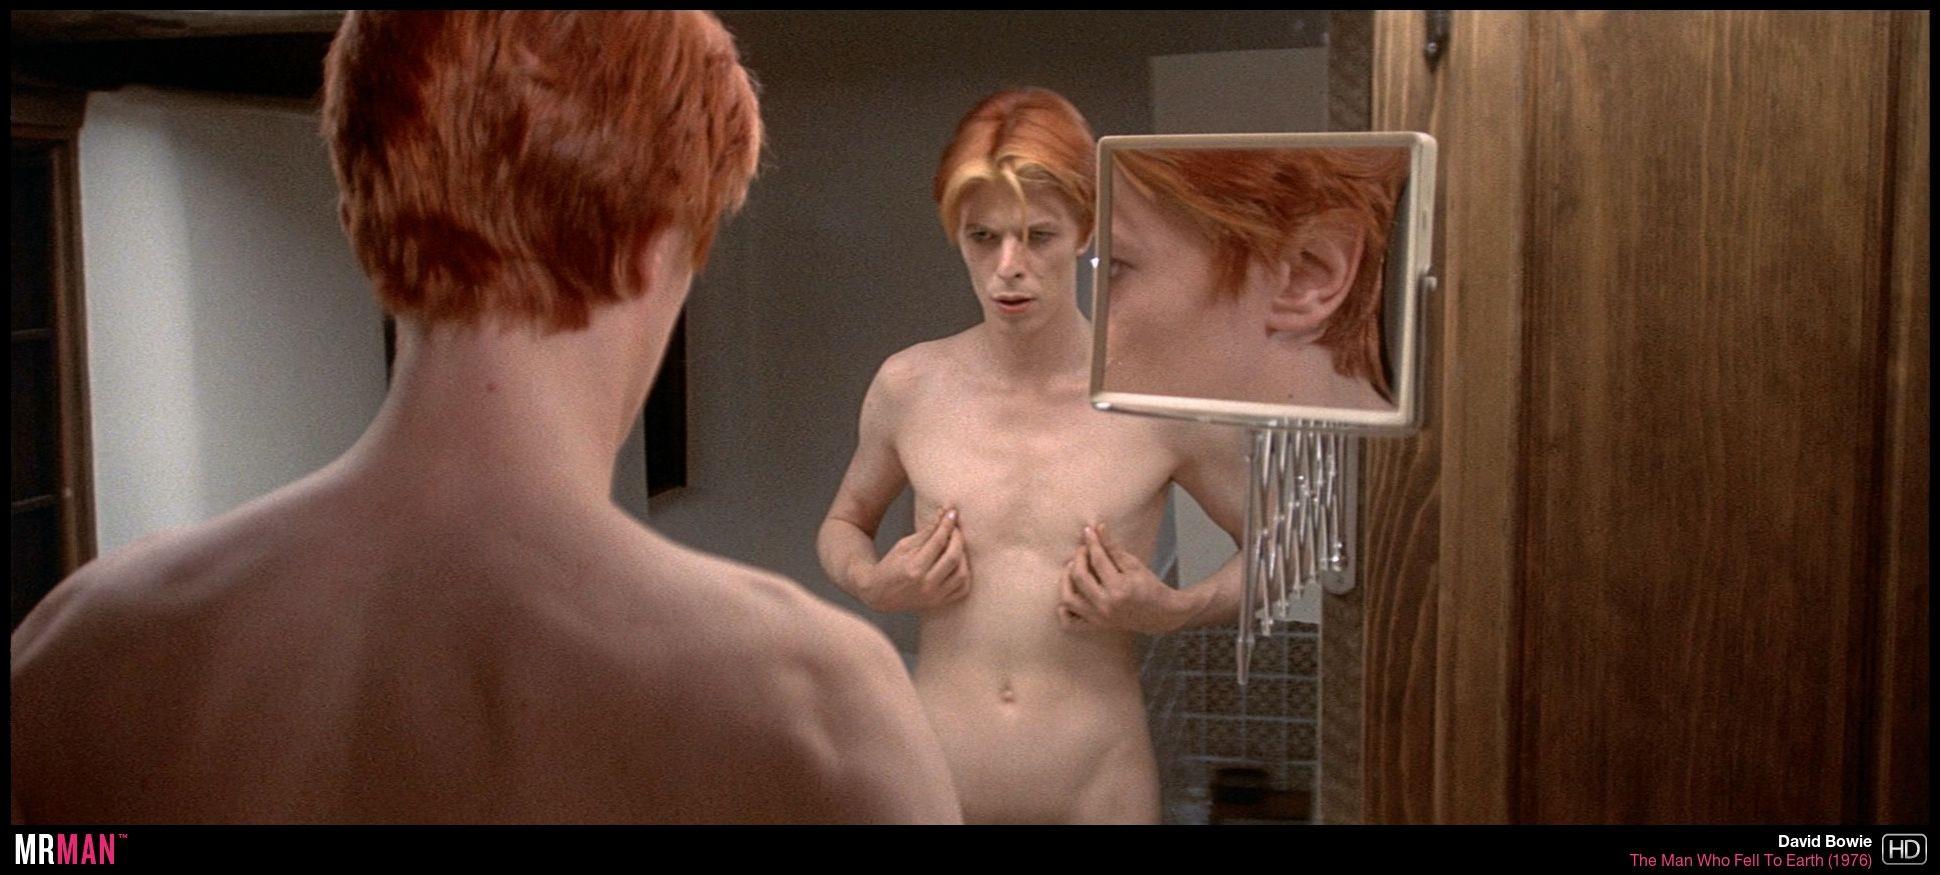 Nudes Of Male Celebrities